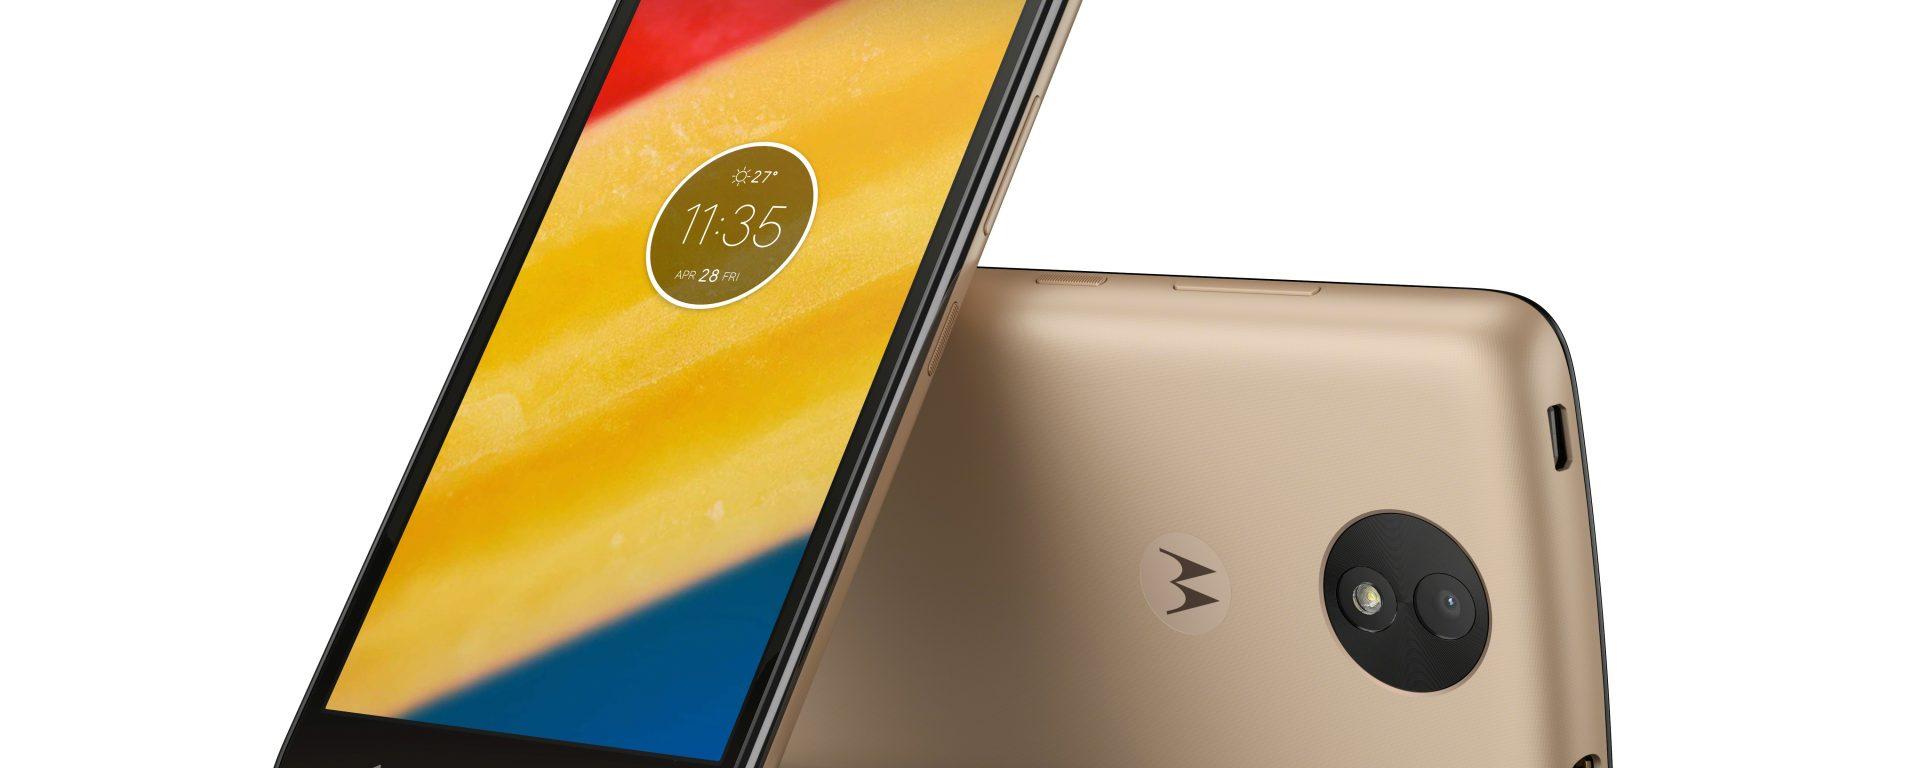 170516_Lenovo-Moto_Moto-C-Plus-Fine-Gold-Front-Back